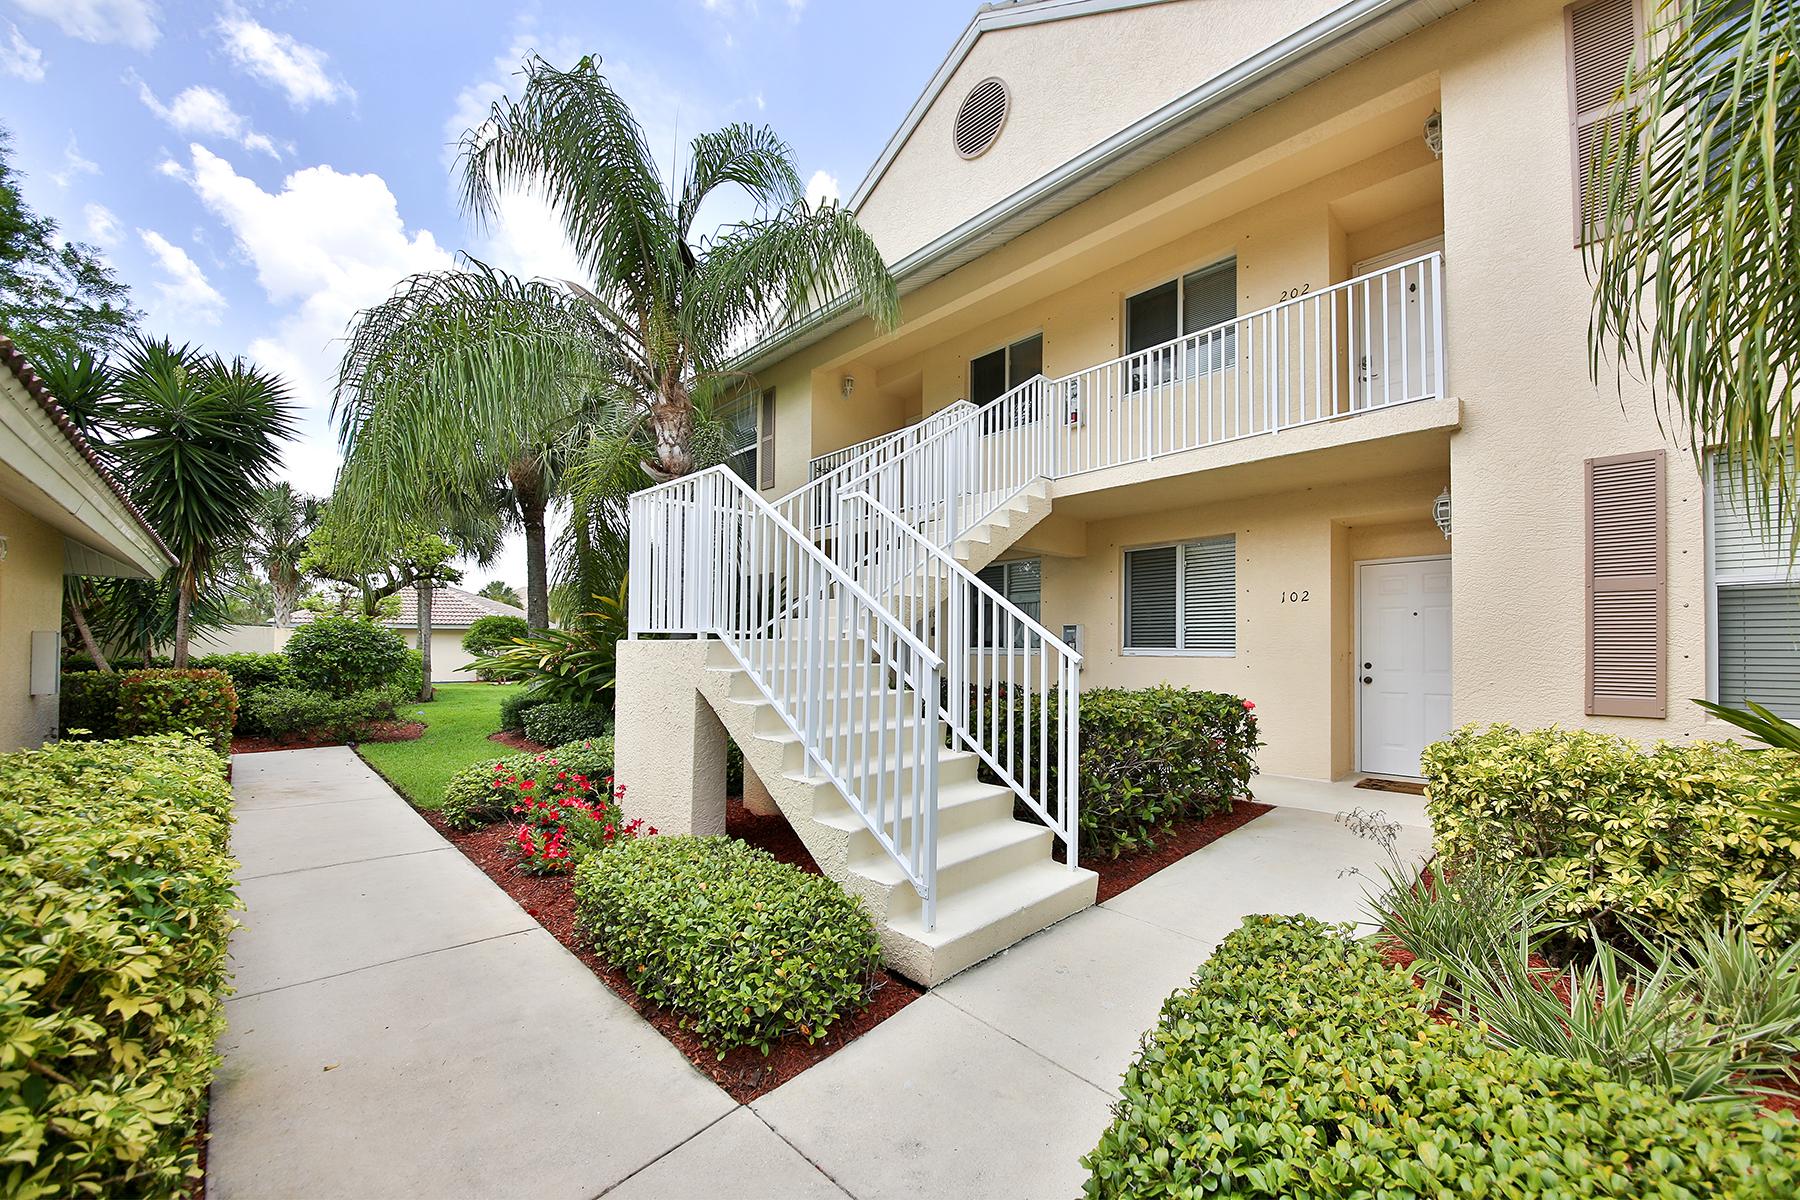 Condomínio para Venda às NAPLES - SHERWOOD 432 Valerie Way 201 Naples, Florida 34104 Estados Unidos